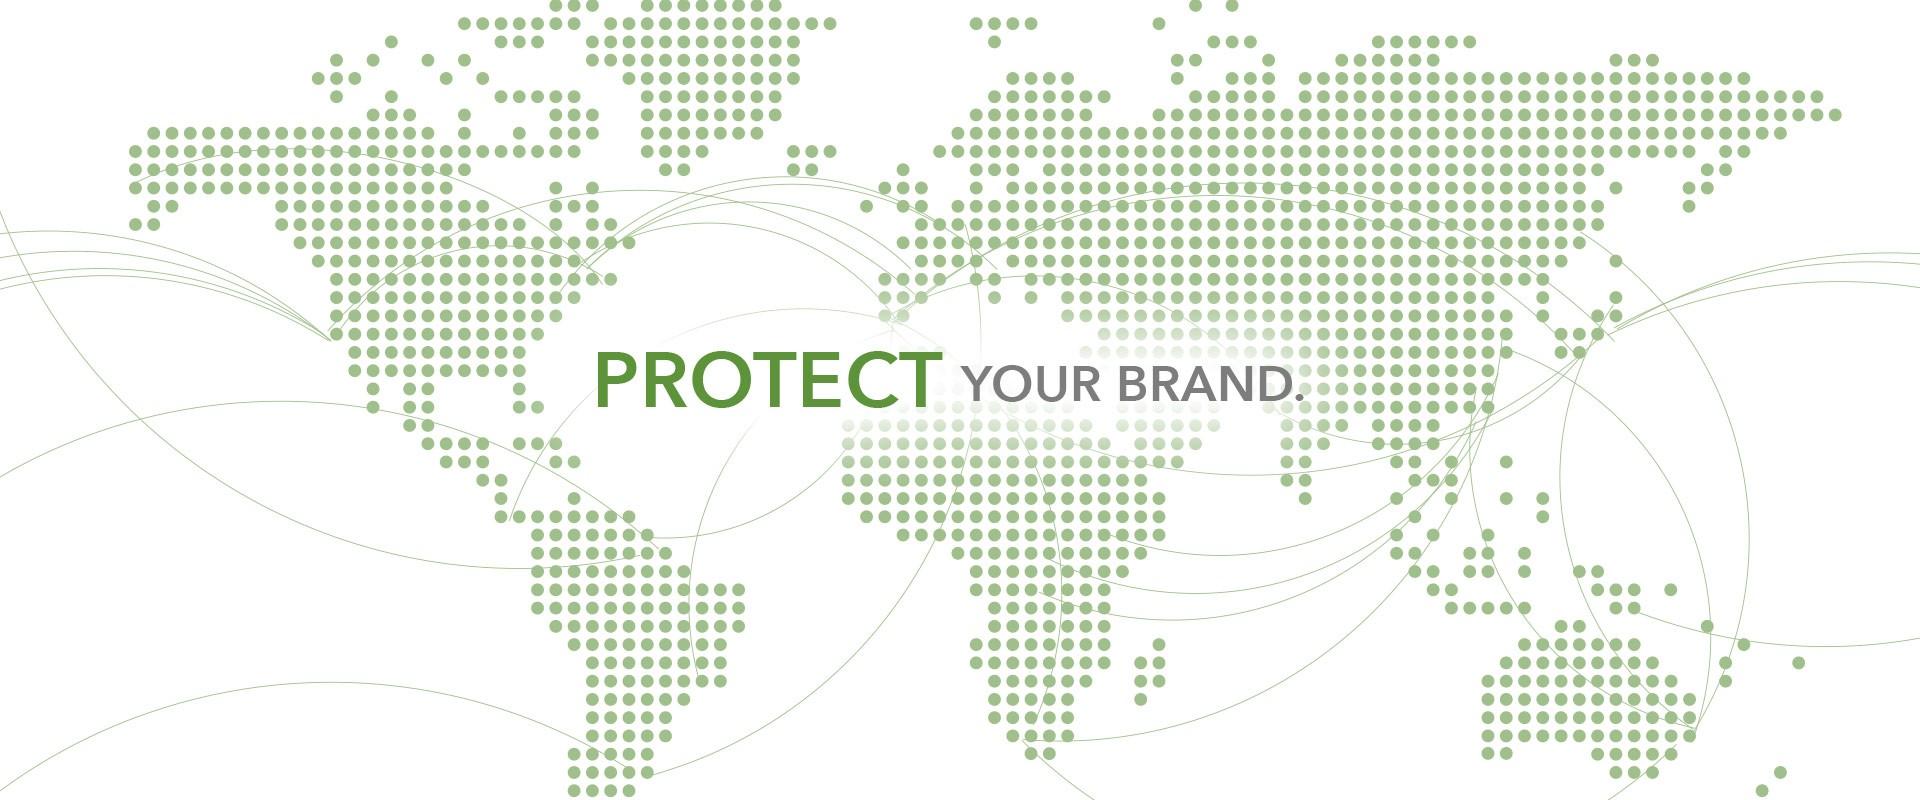 Global Ewaste Solutions | LinkedIn